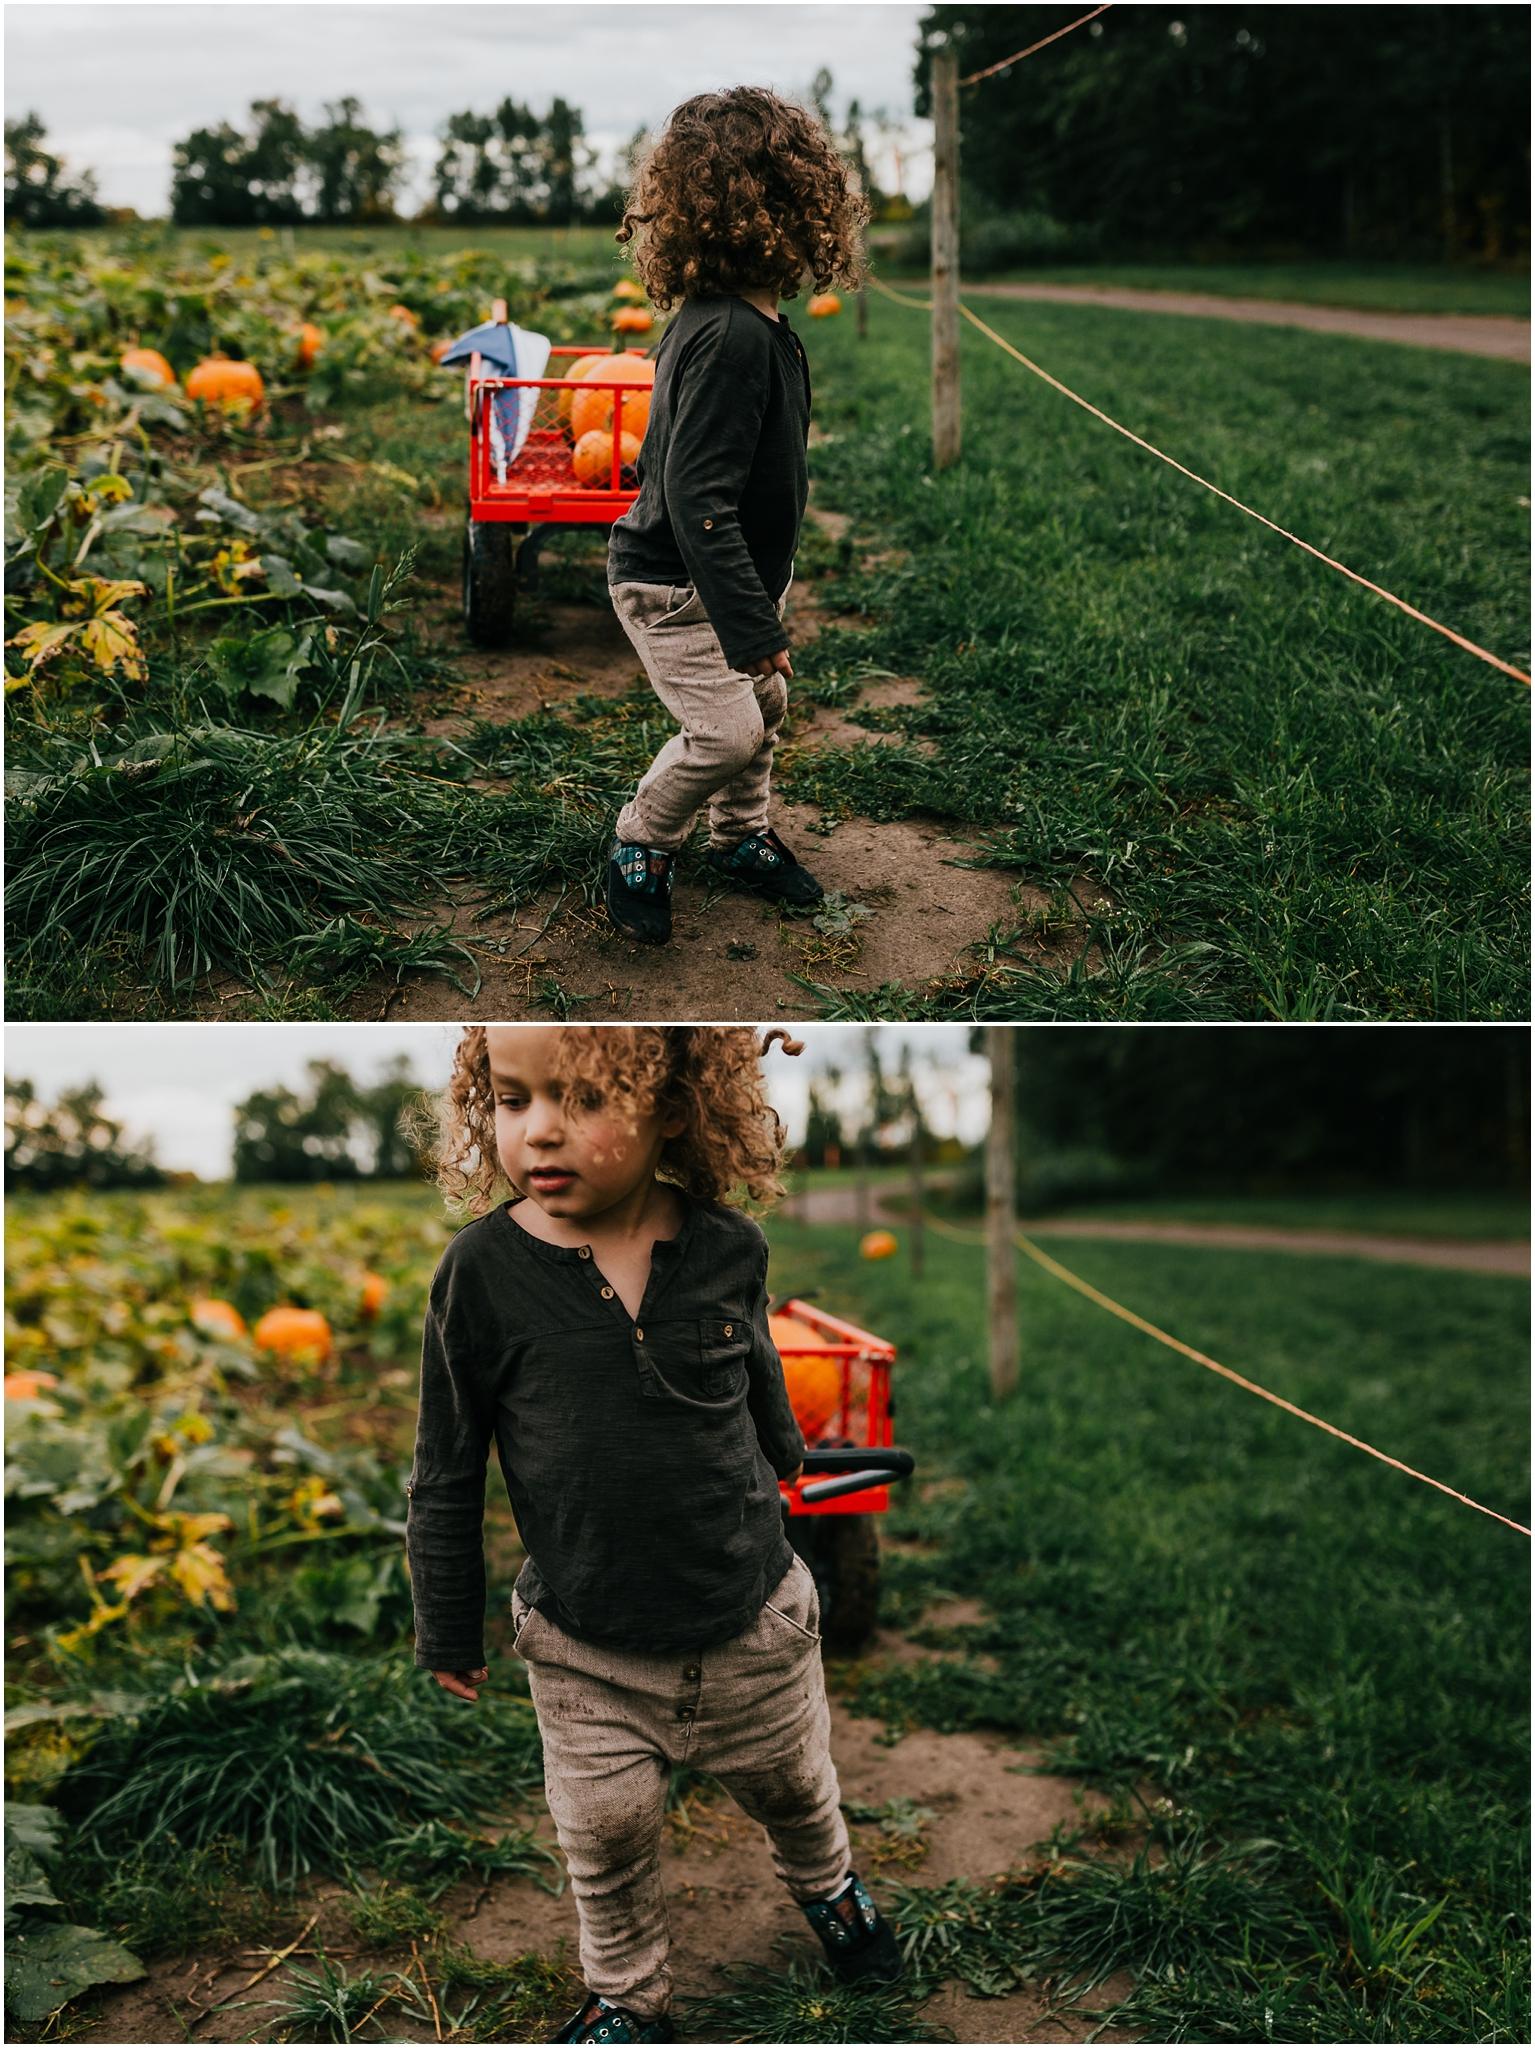 Edmonton Lifestyle Photographer - Treelines Photography - Edmonton Documentary Photographer - Pumpkin Picking Parkland County